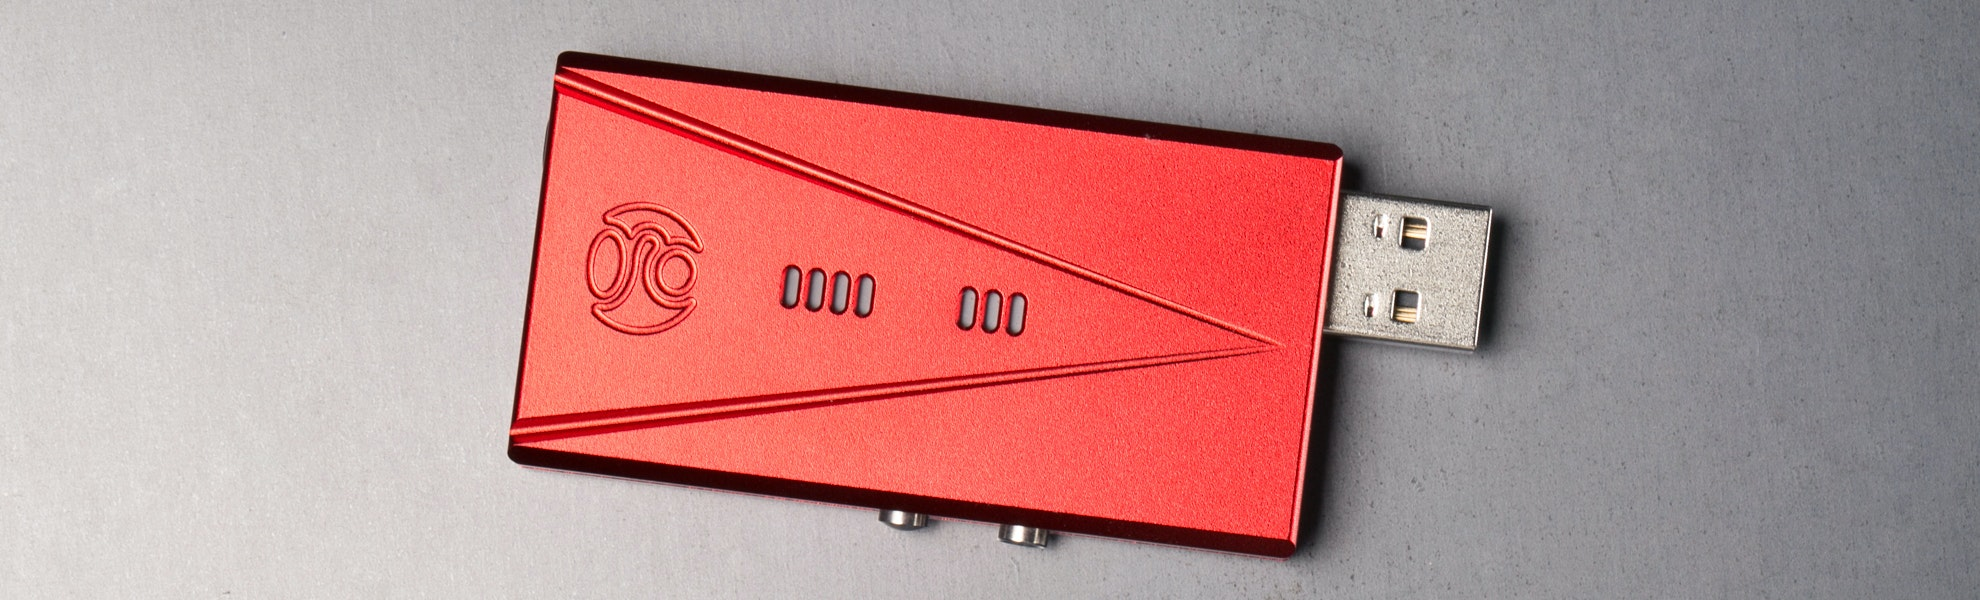 Geek Out 1000 USB DAC/Amp